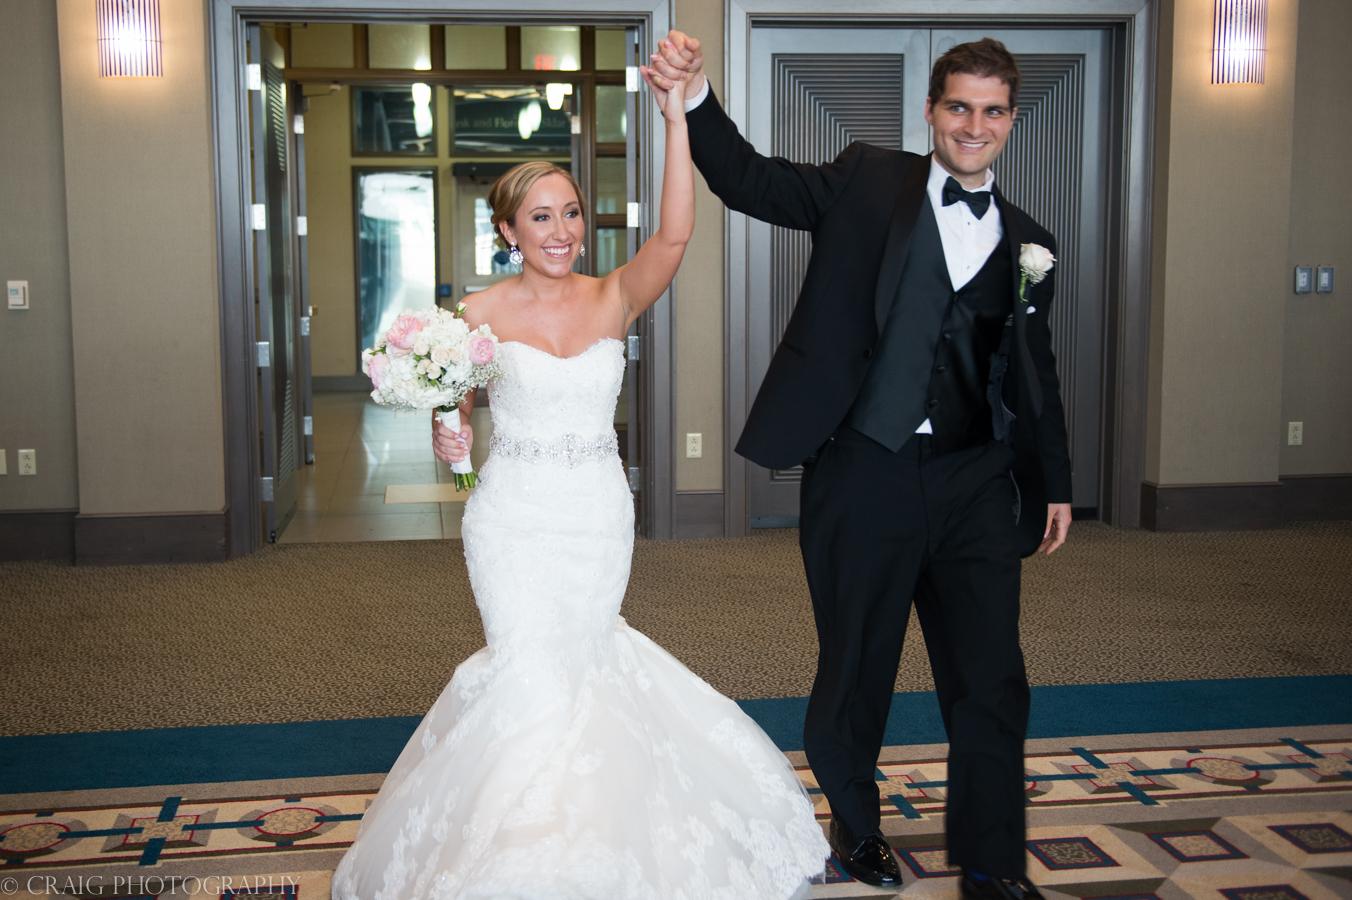 Duquesne University Power Center Ballroom Weddings-0047